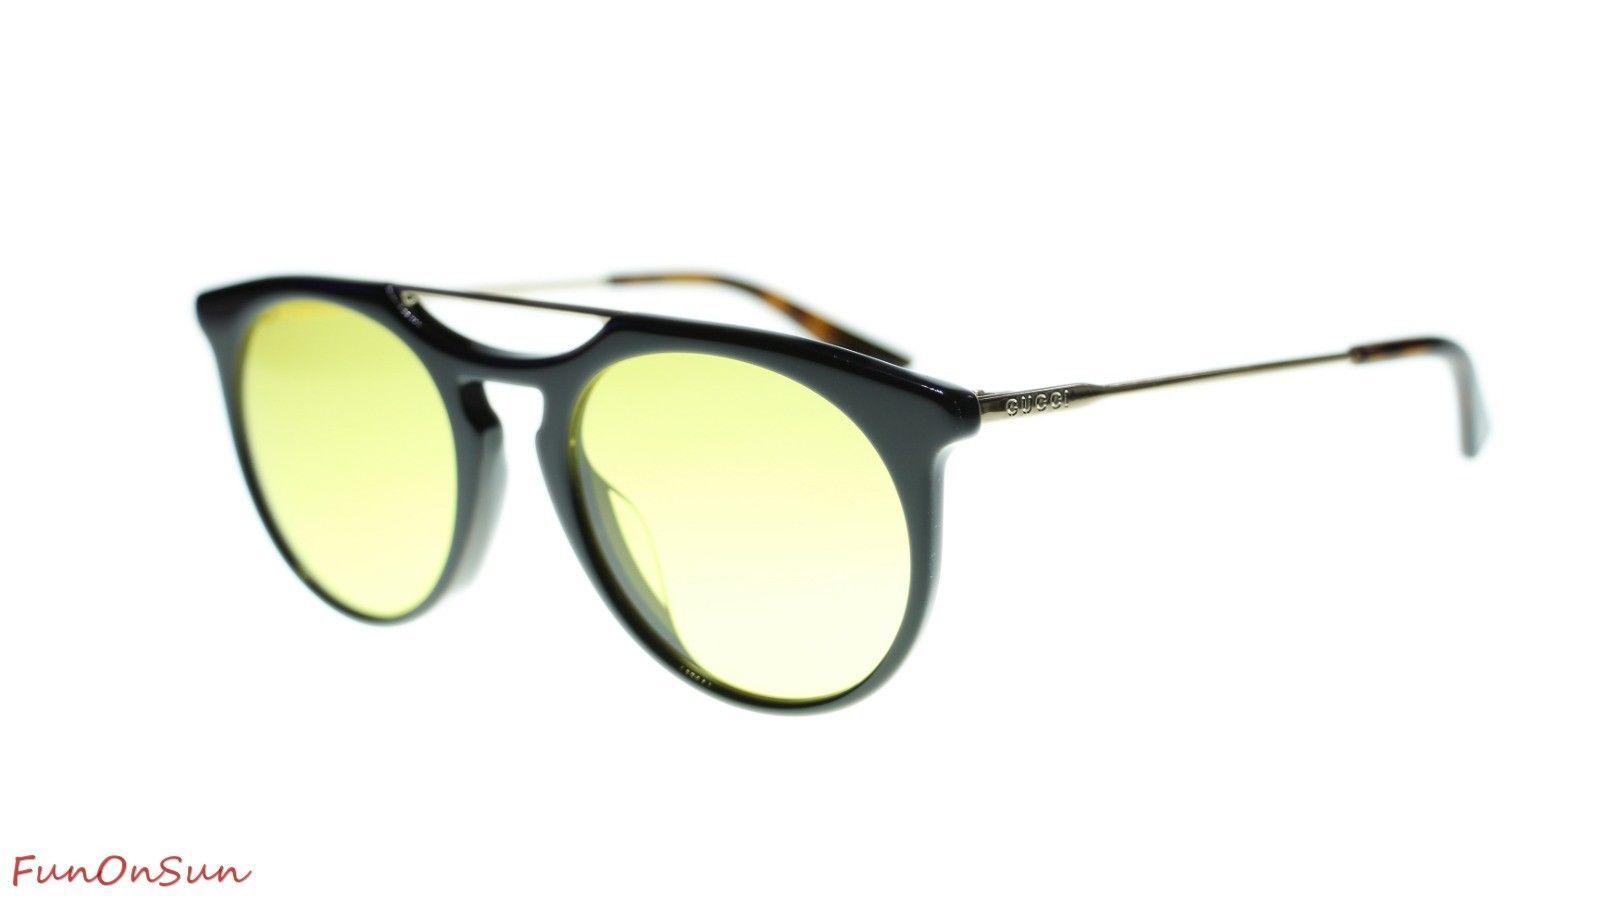 84fb4cb0b6 NEW Gucci Men Sunglasses GG0320S 002 Black and 50 similar items. 10